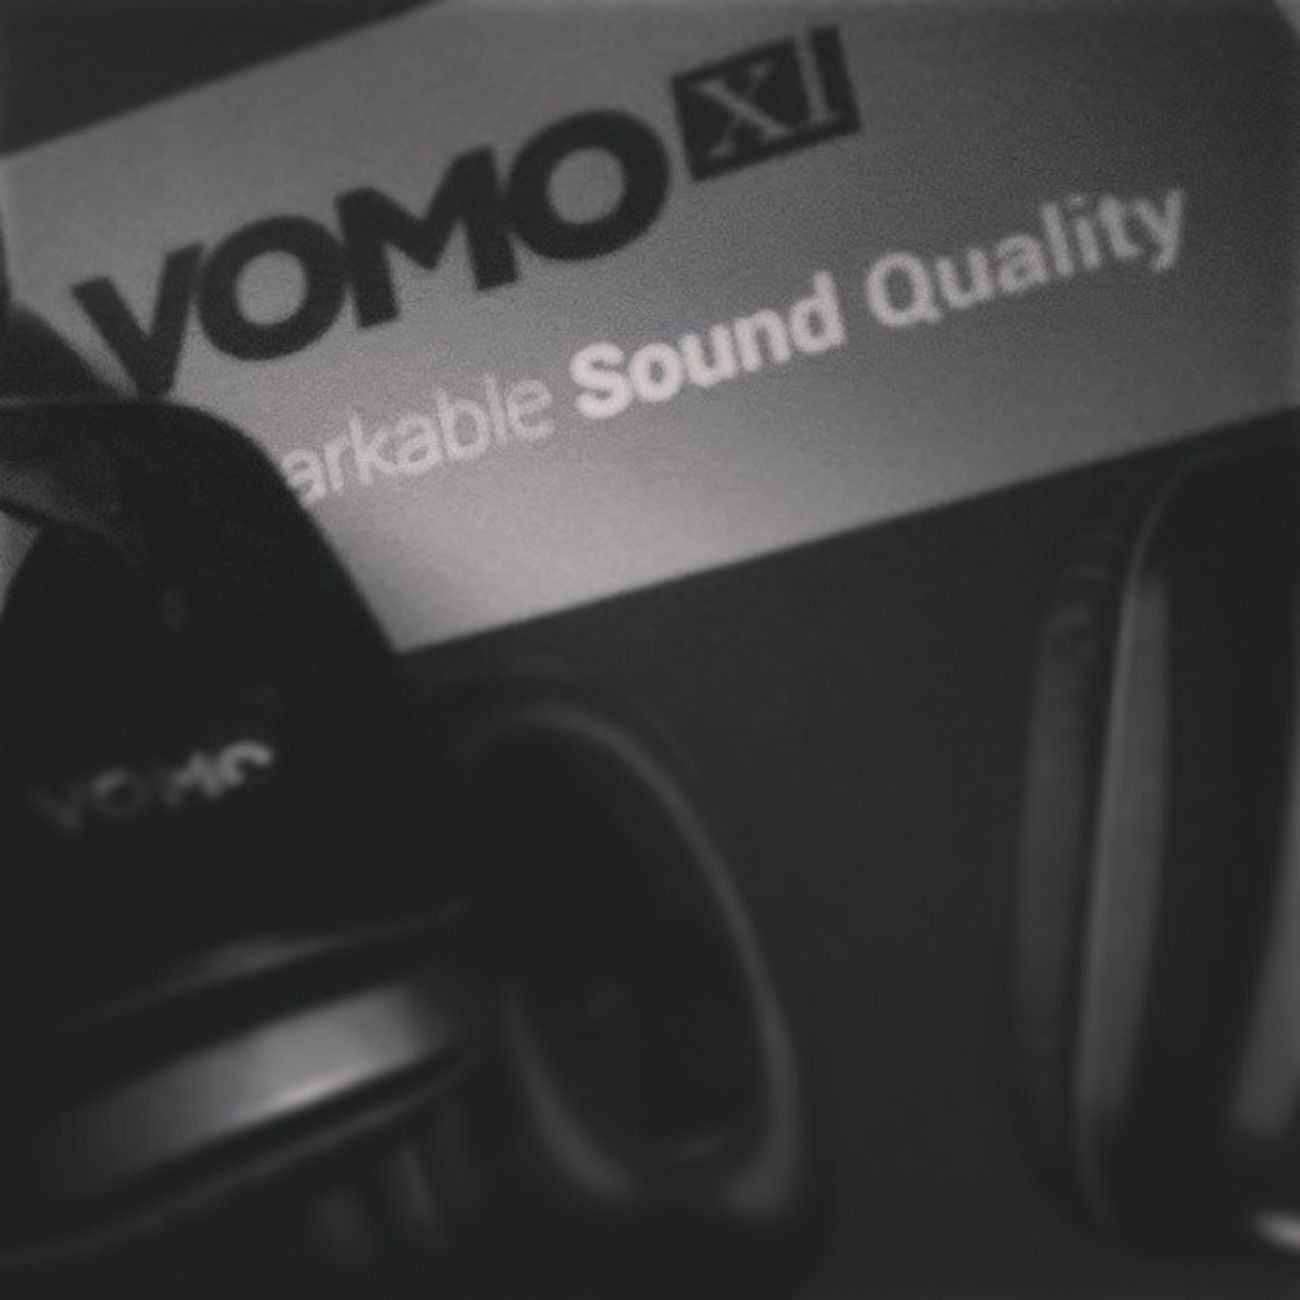 Just got my new New Headphones Wleaf Vomo Black Amazing sound